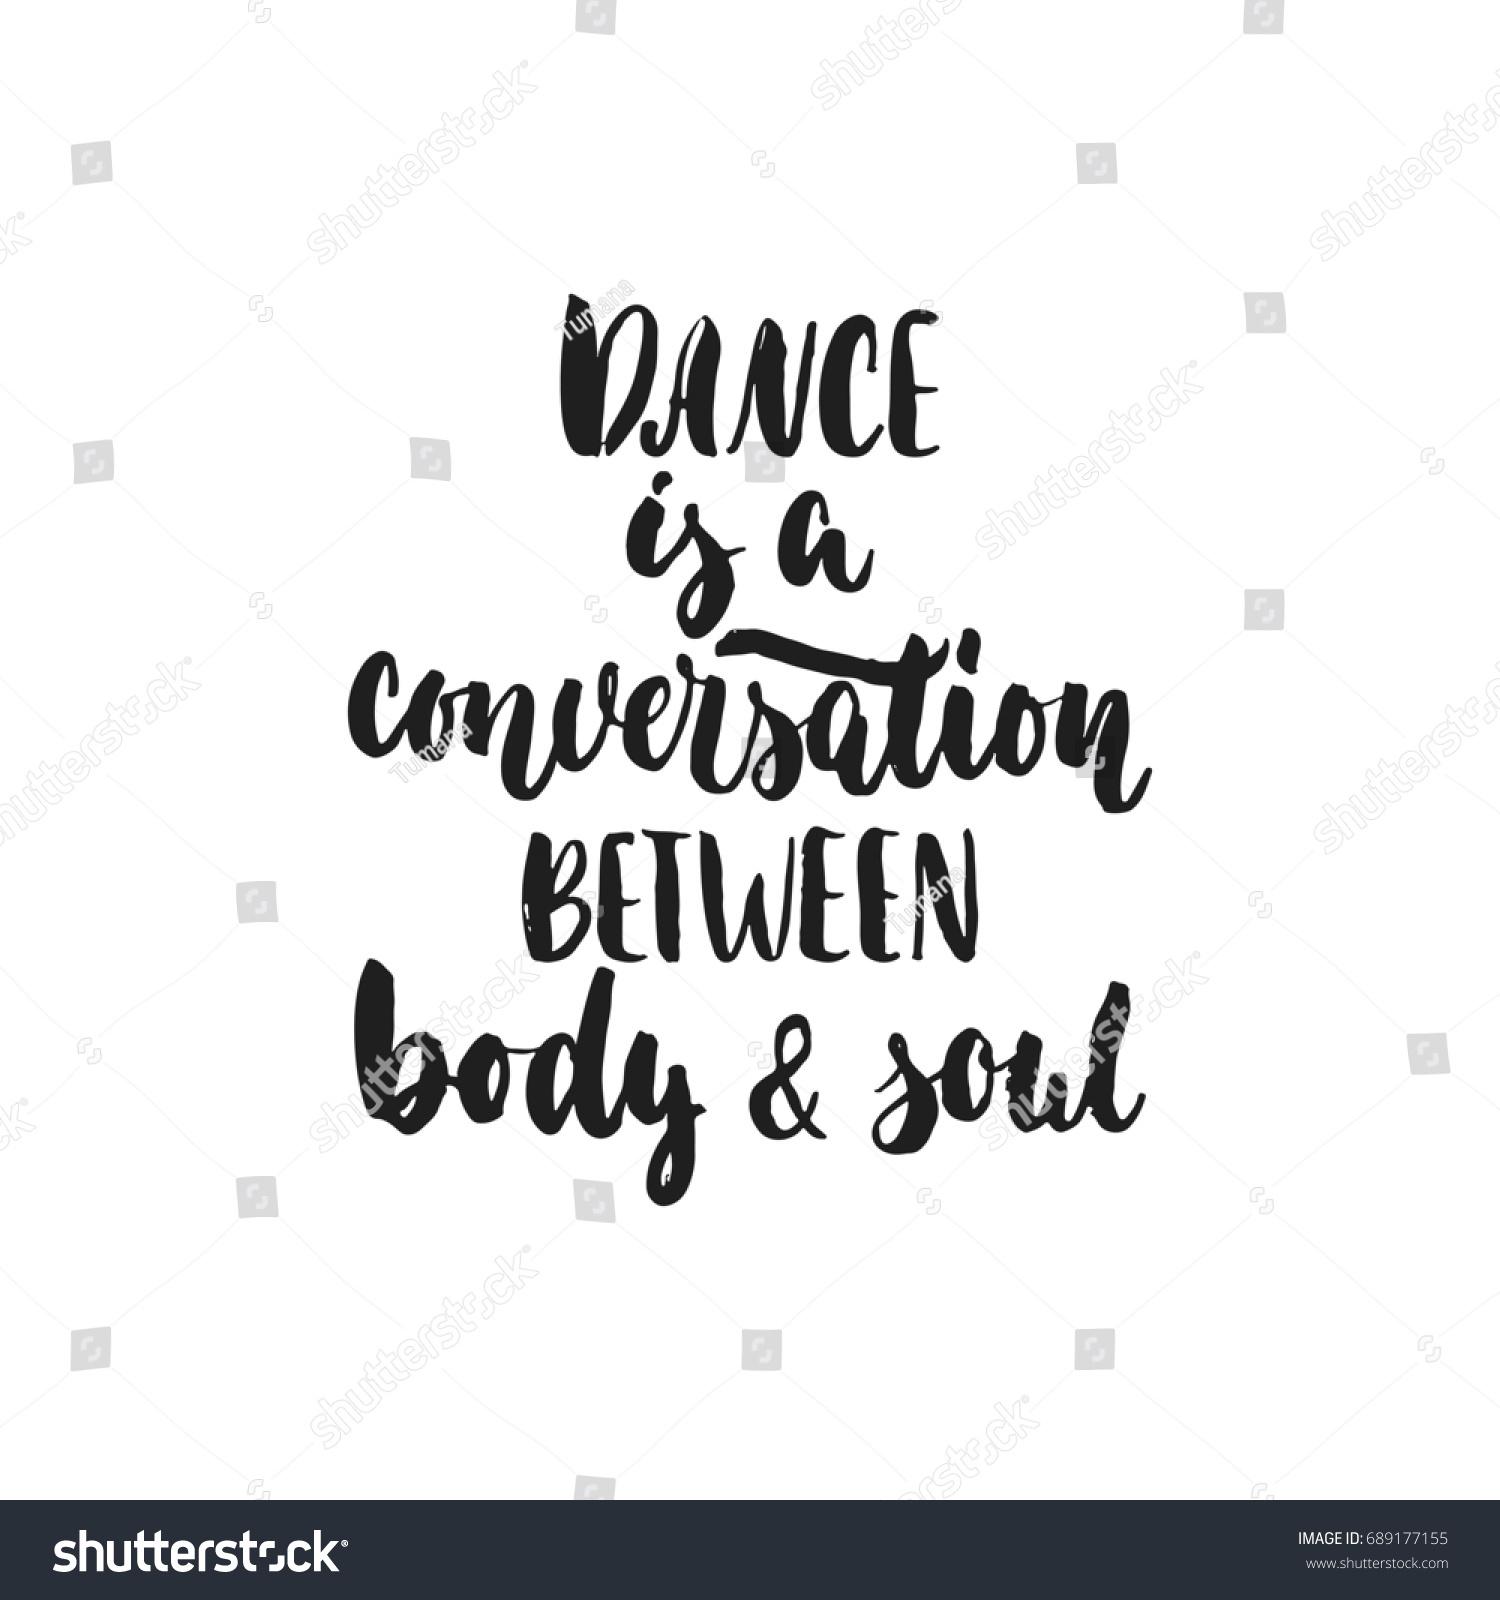 Dance Conversation Between Body Soul Hand Stock Illustration